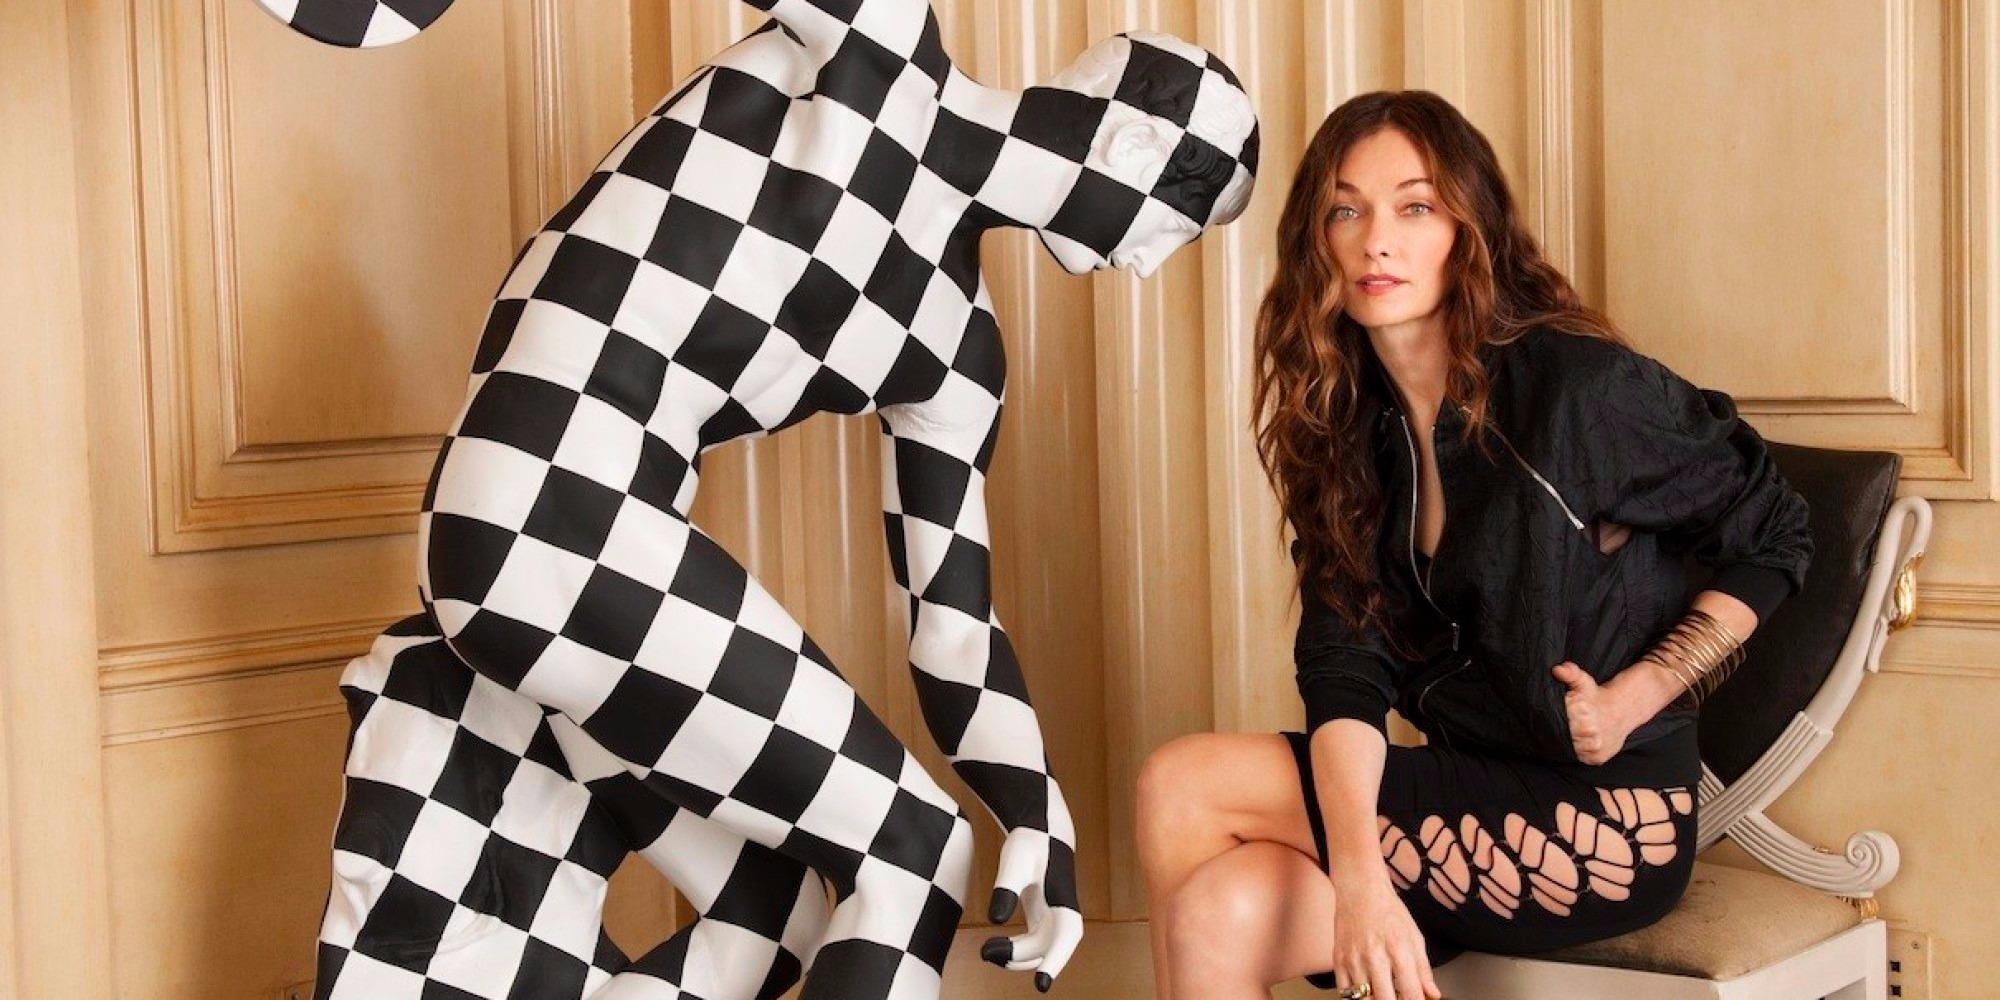 Top Designers Kelly Wearstler - checkered sculpture - black dress - interior designers - fabulous designers - empowering women - empowered women - luxury interior designers